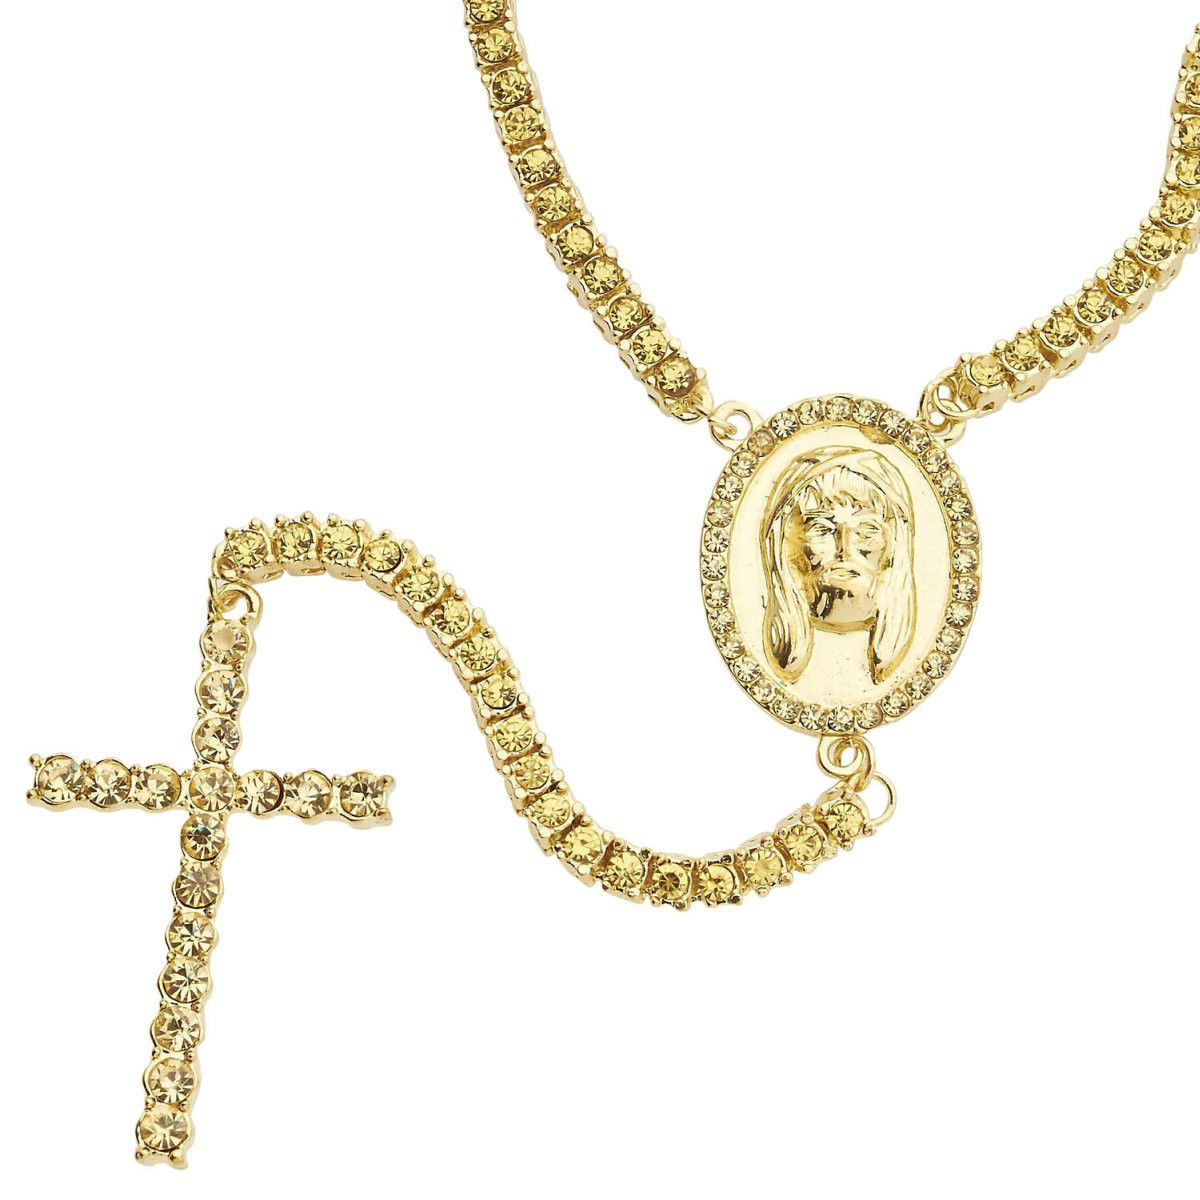 Iced Out Bling XXL SHIINIG ROSARY Chain - gold / gold - Uni / zlatá